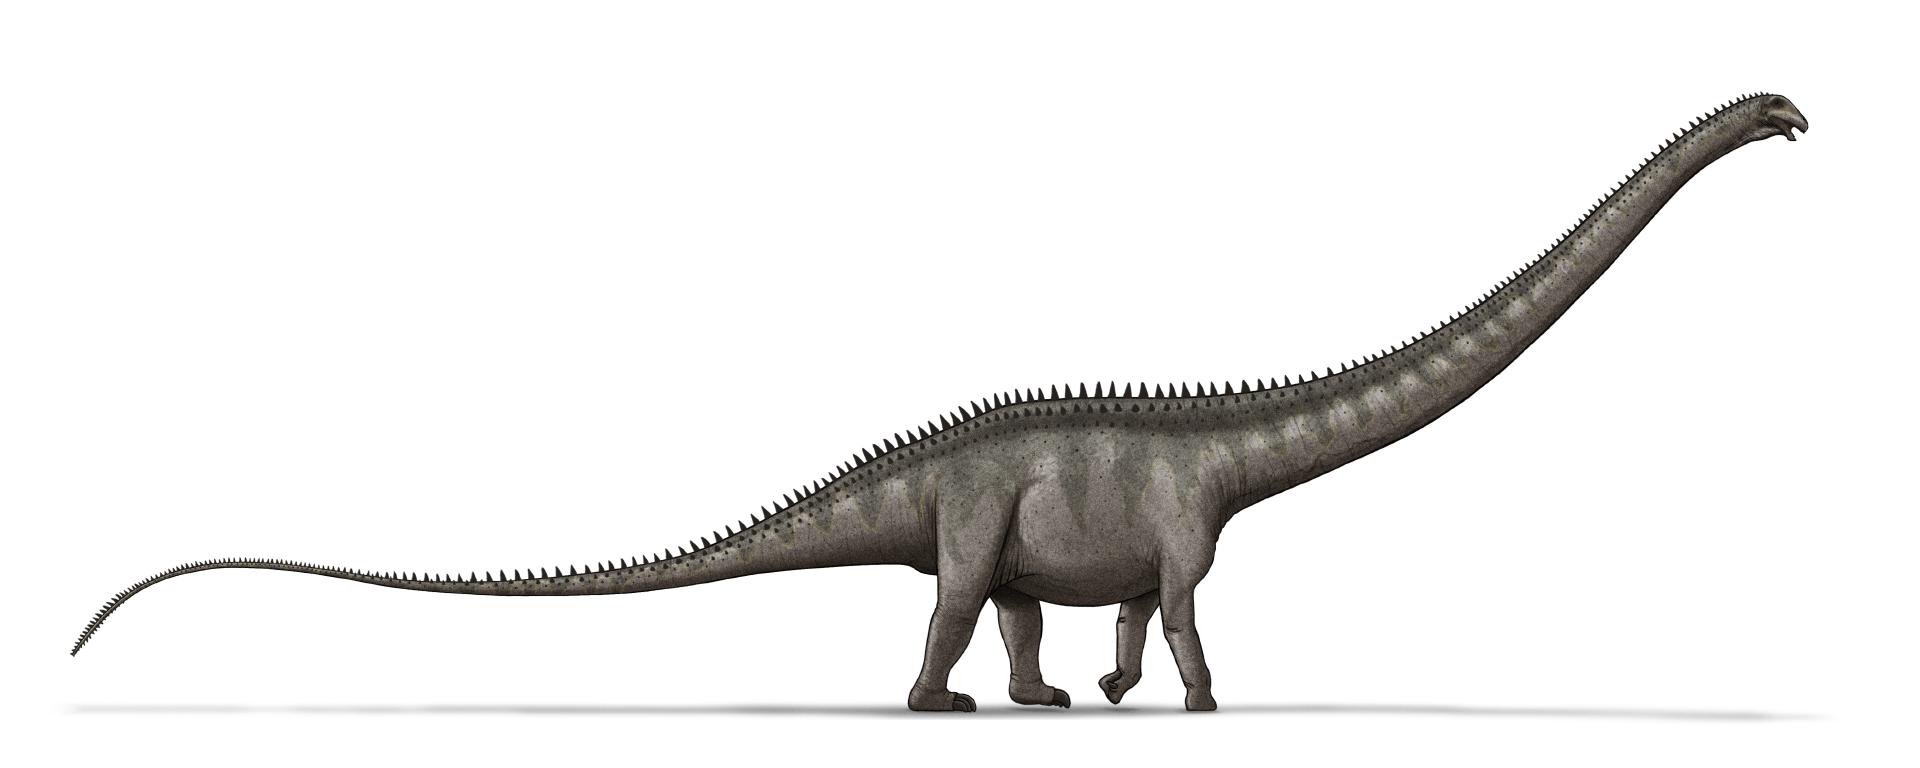 Description supersaurus dinosaur